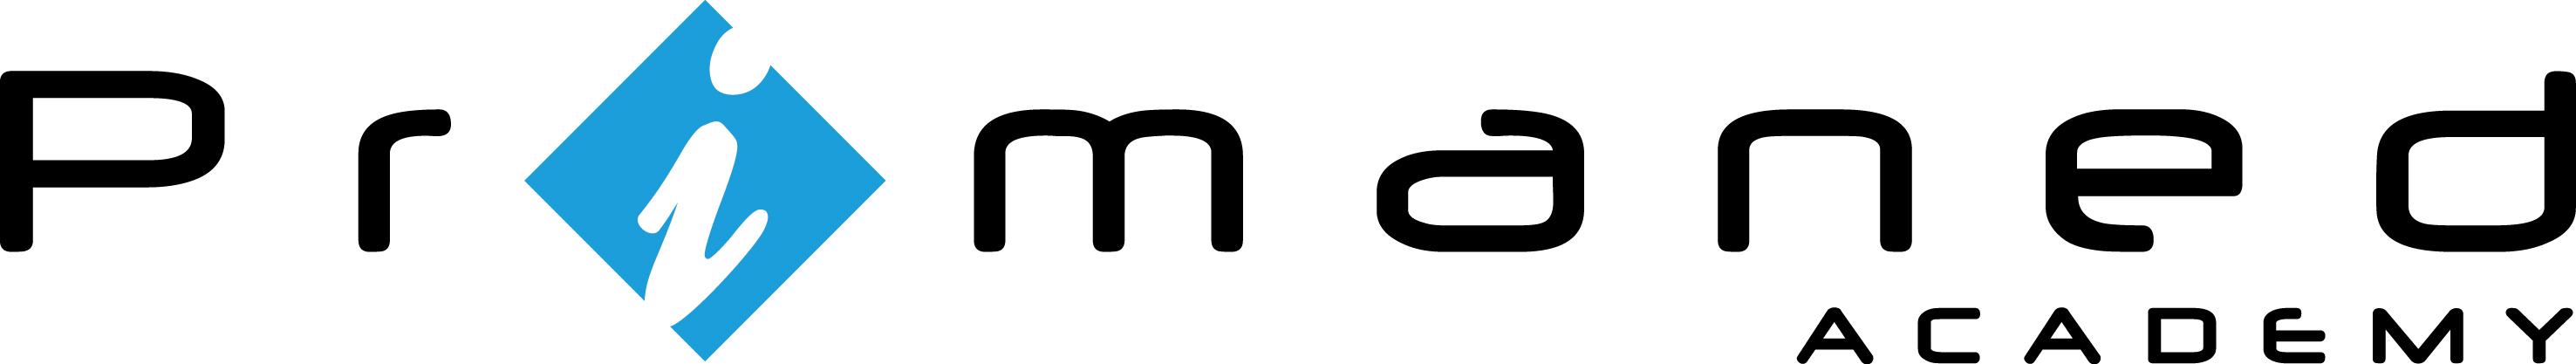 Primaned Academy logo